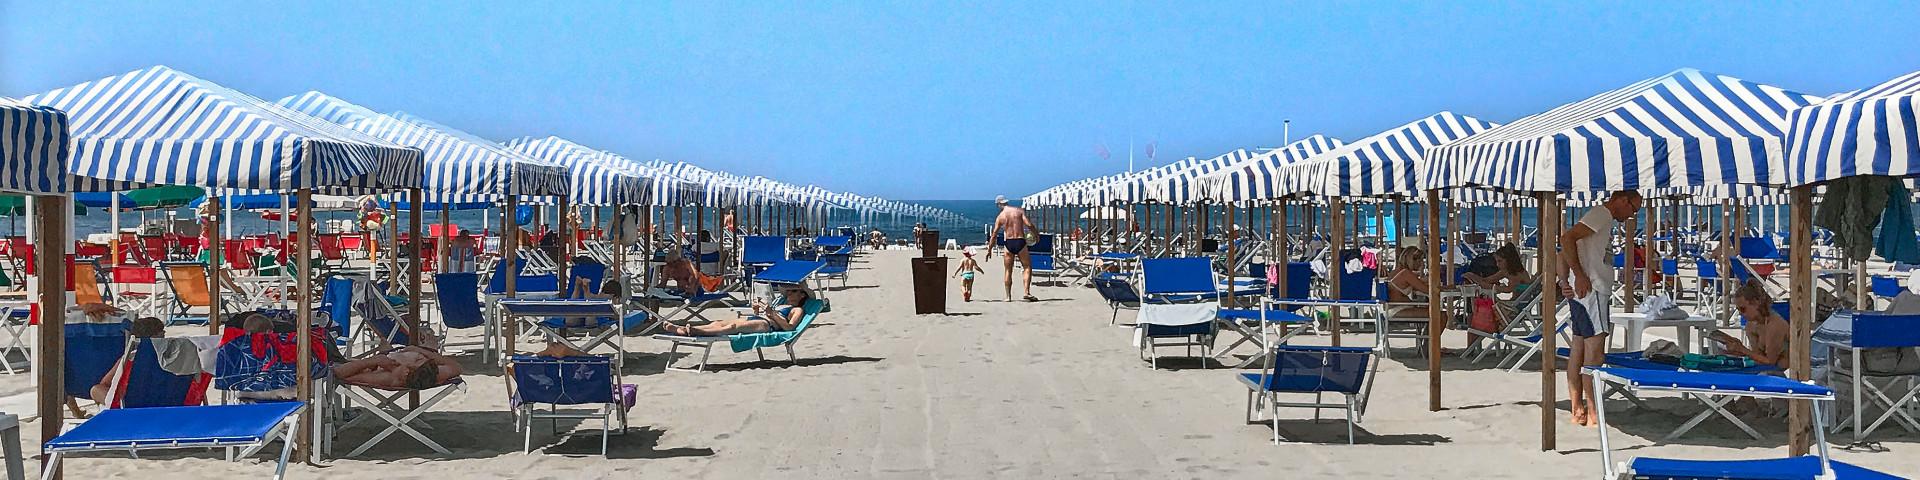 Beach settings from Bagno Eva